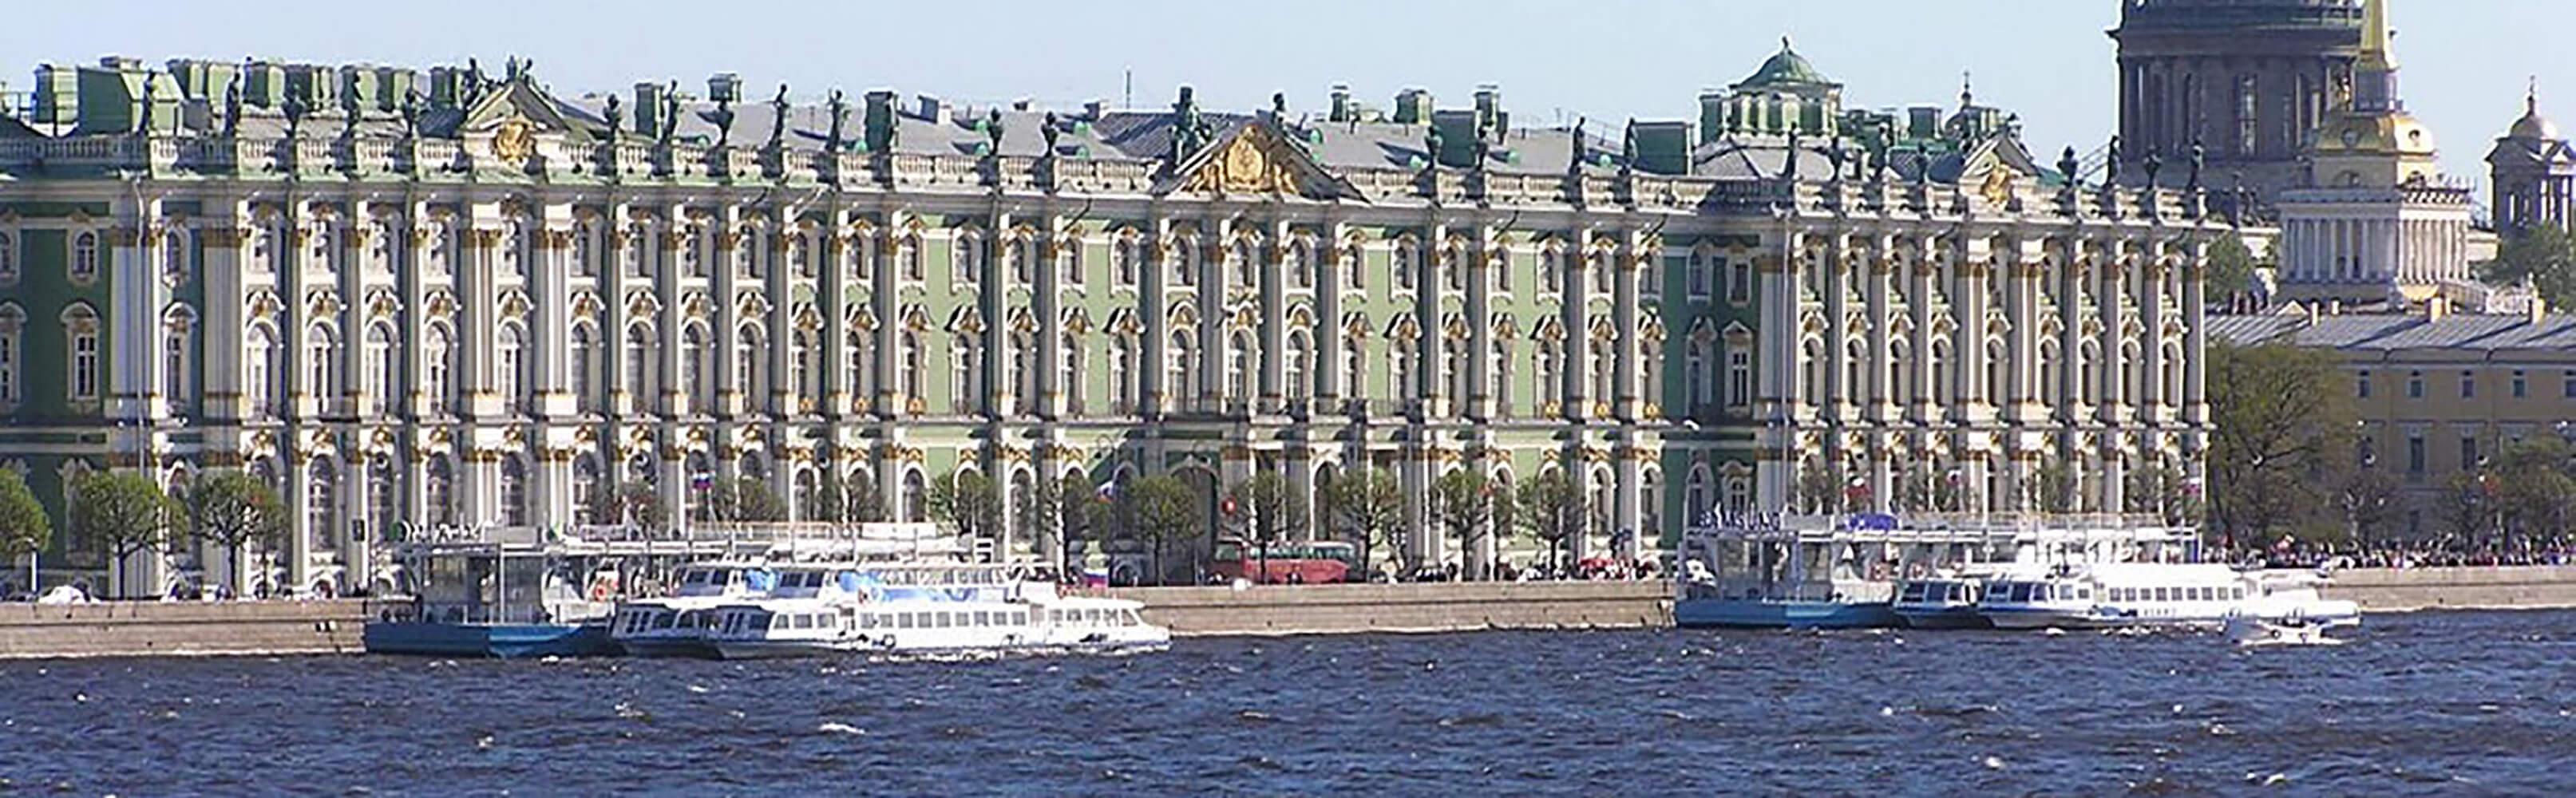 Eremitage (Sankt Petersburg) 1